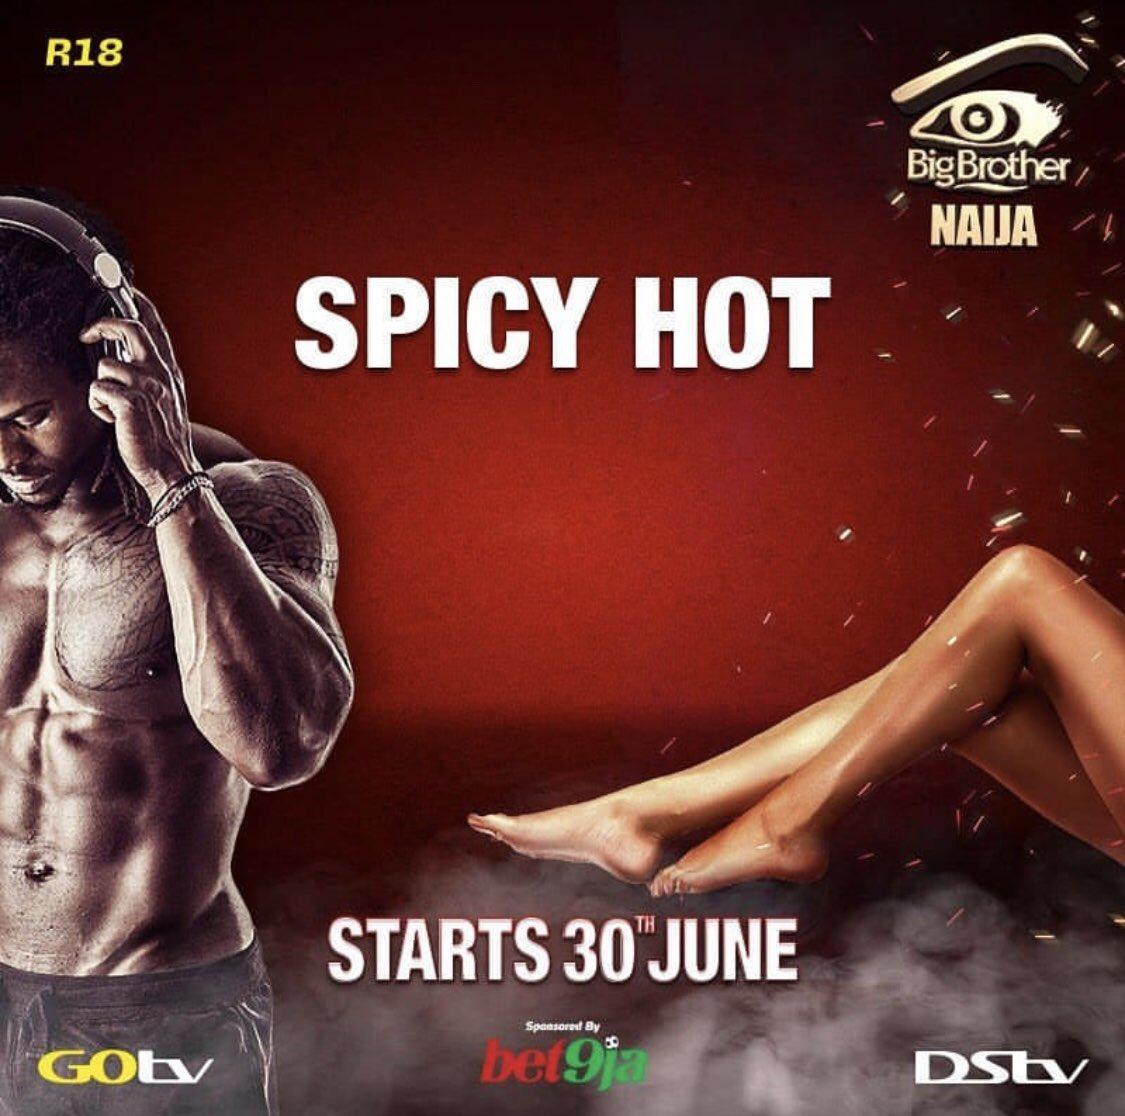 bbn - #BBNAIJA: Reality TV Show, Big Brother Naija Announces Its Premier Date For 2019